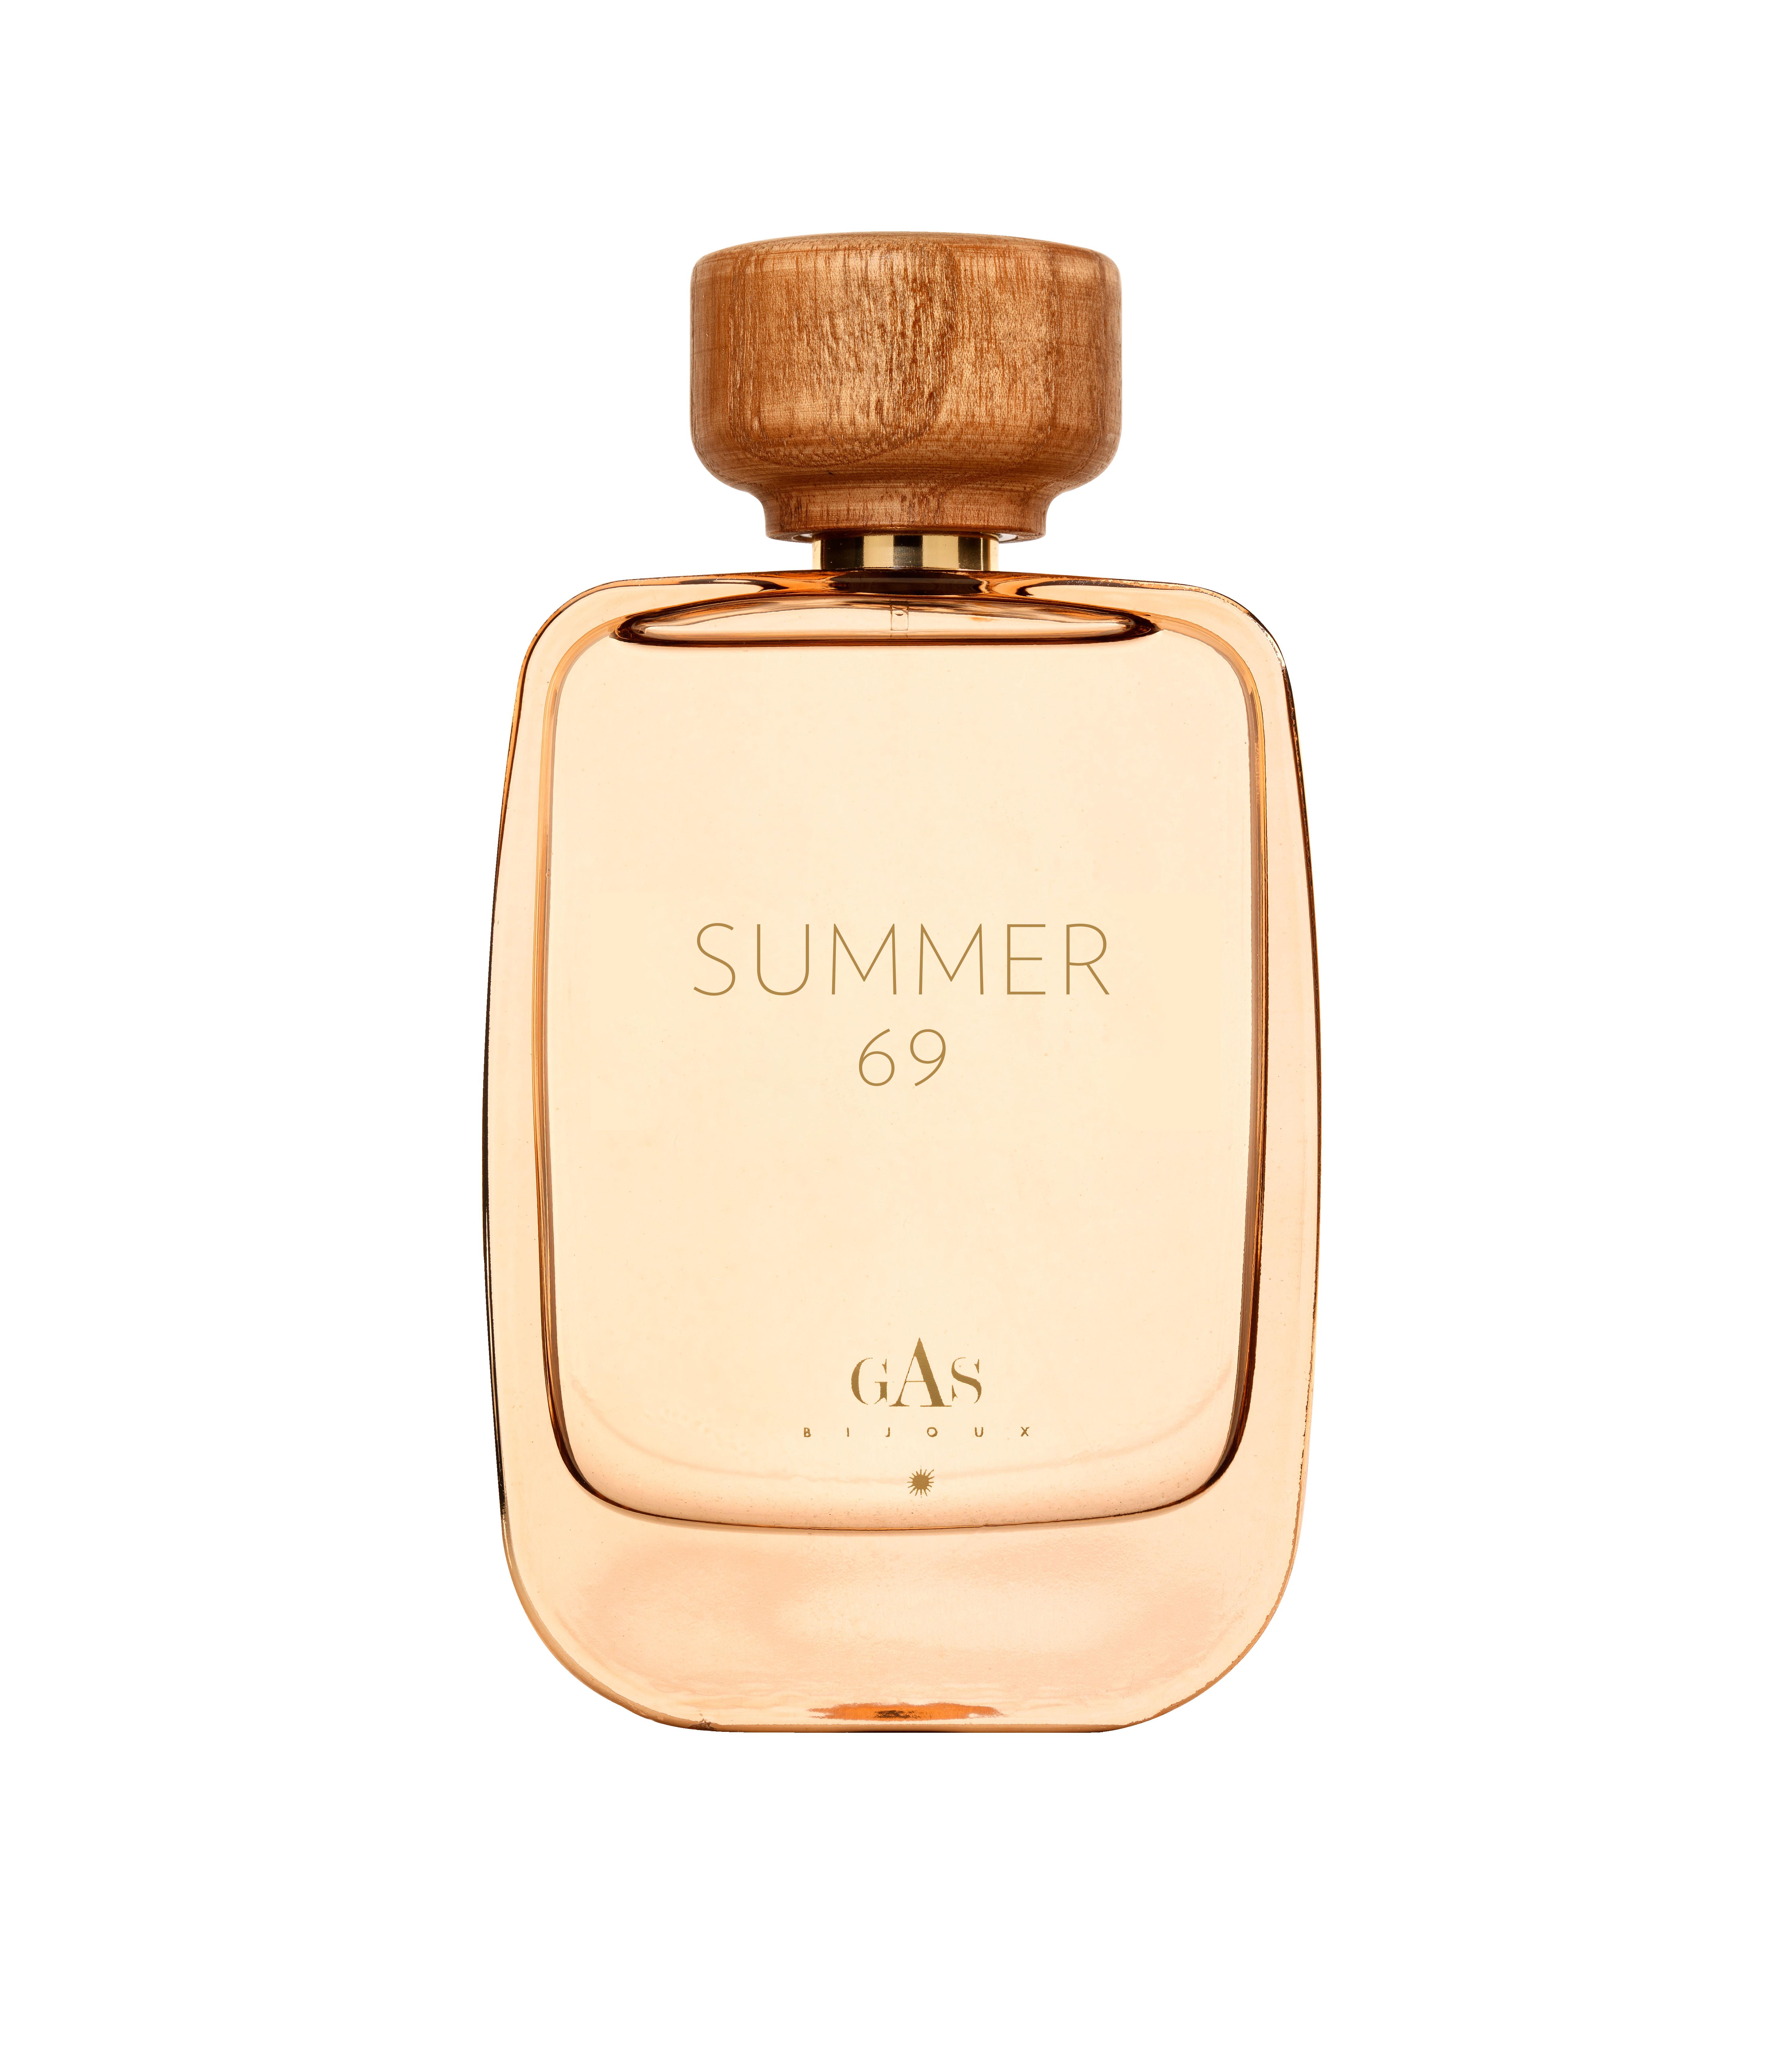 Gas Bijoux Summer 69 Eau de Parfum Spray 100ml